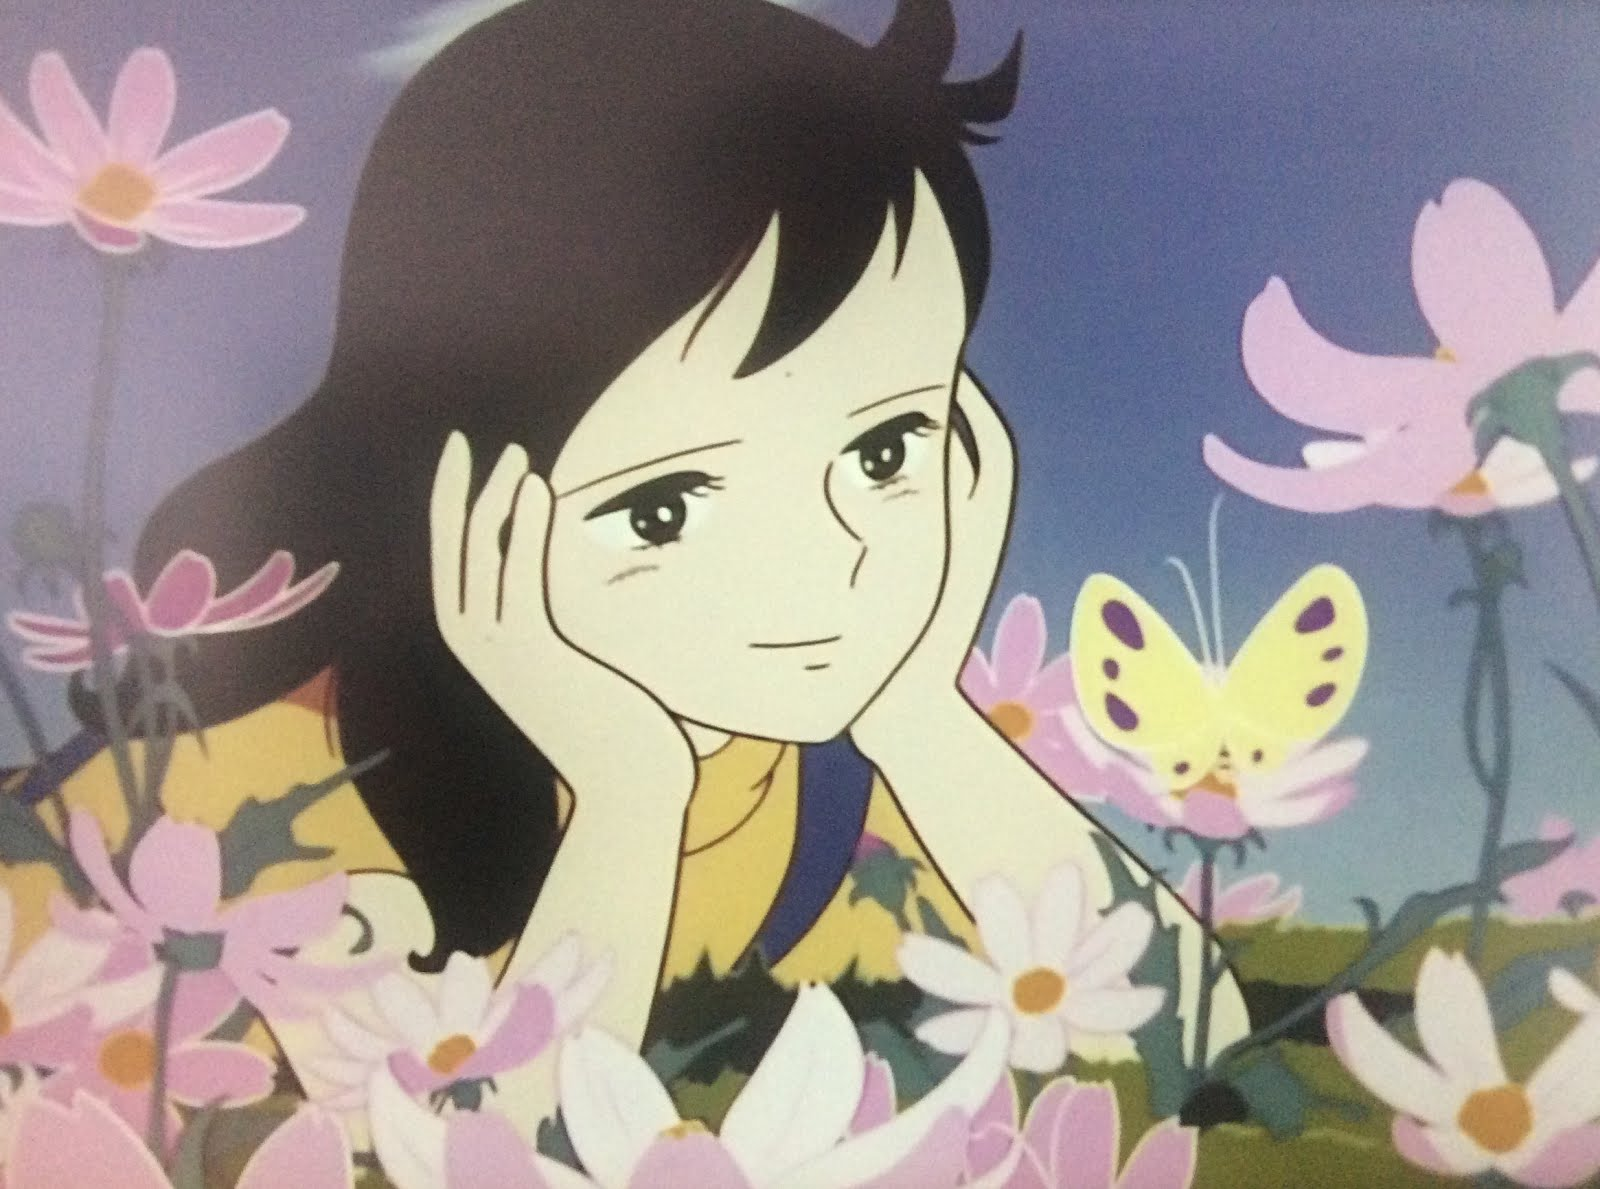 Yuki's Sun: Hayao Miyazaki's 1972 Pilot Film